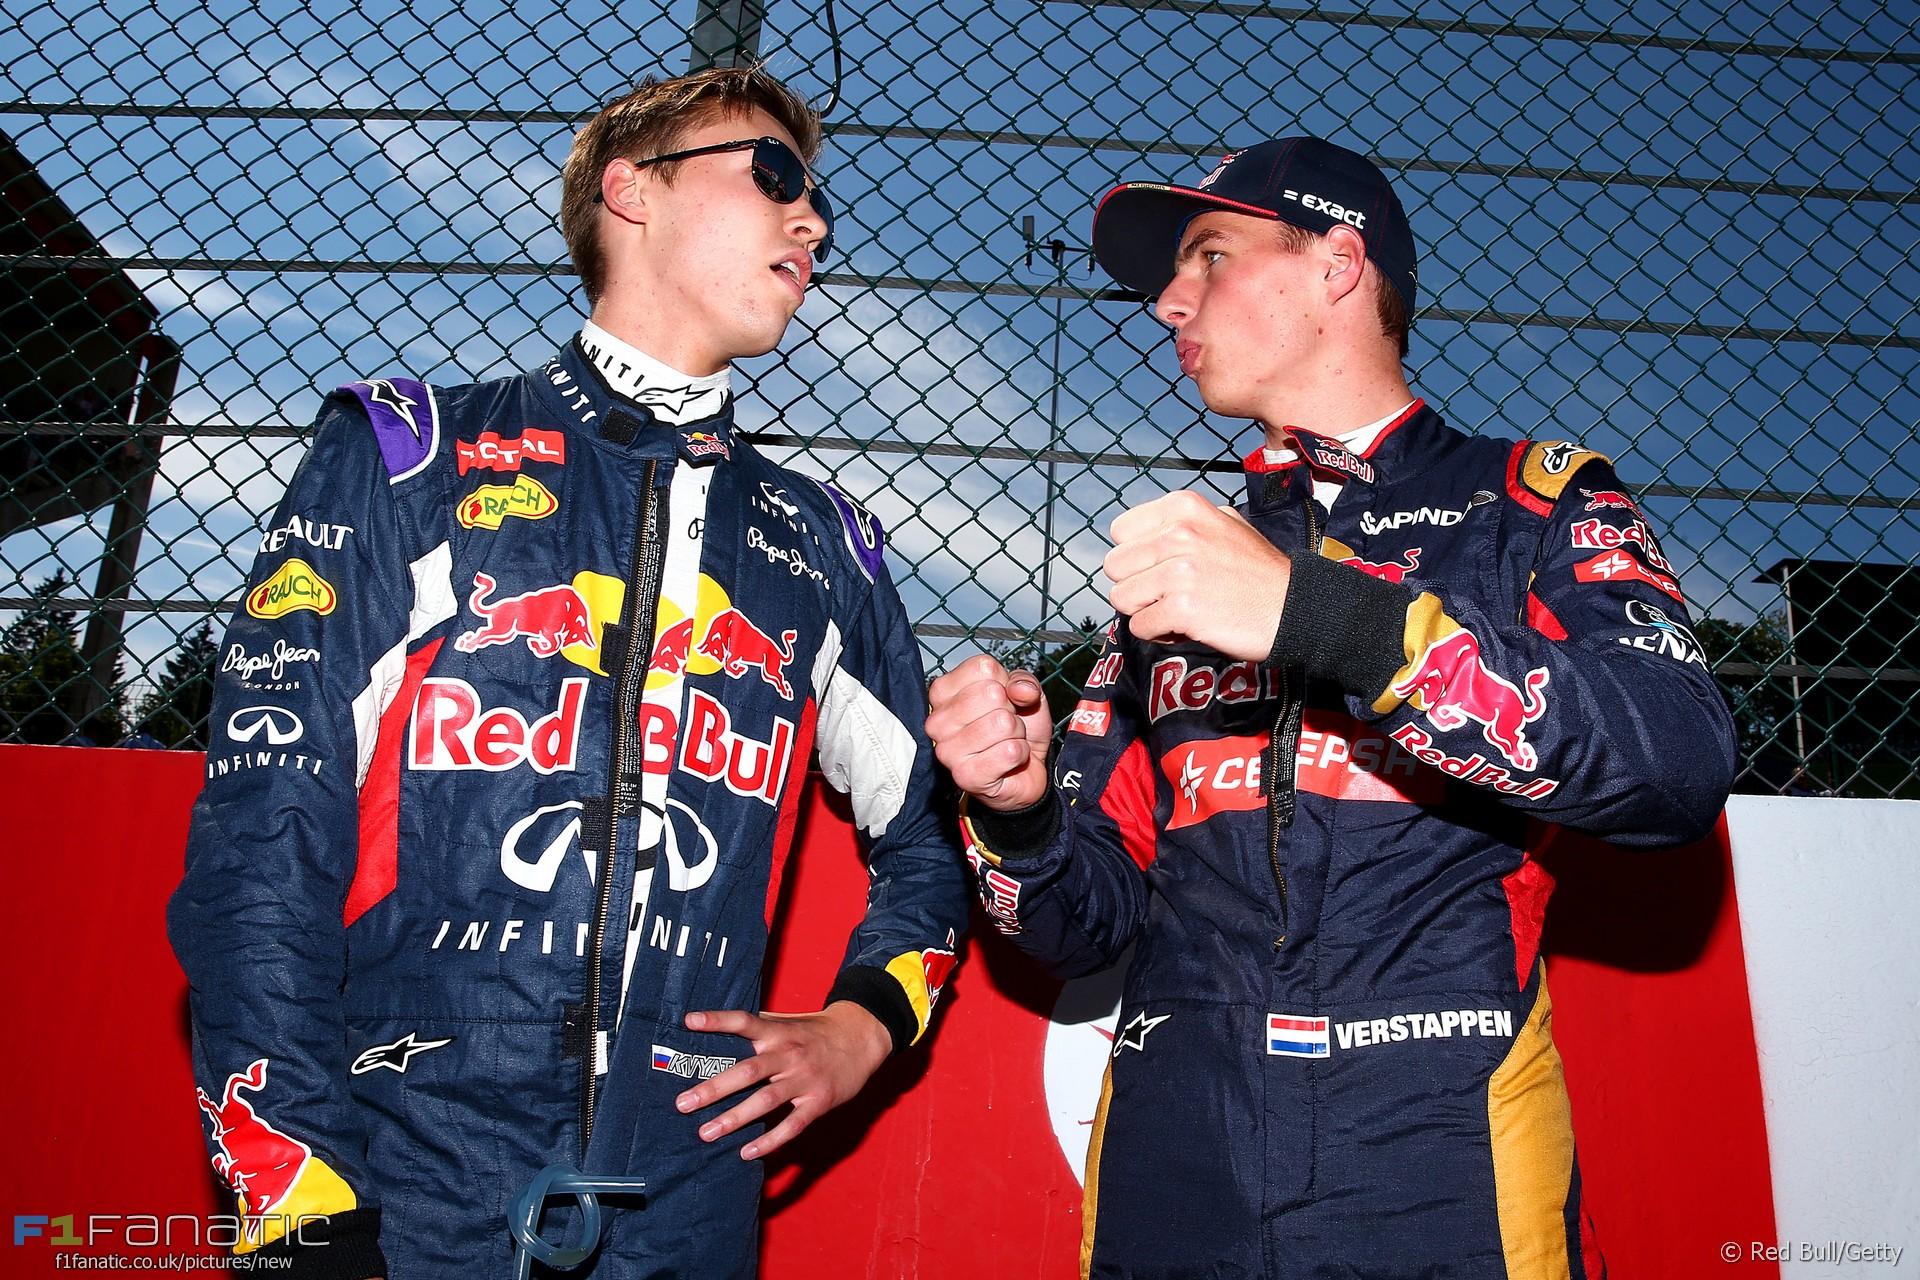 Daniil Kvyat, Max Verstappen, Spa-Francorchamps, 2015